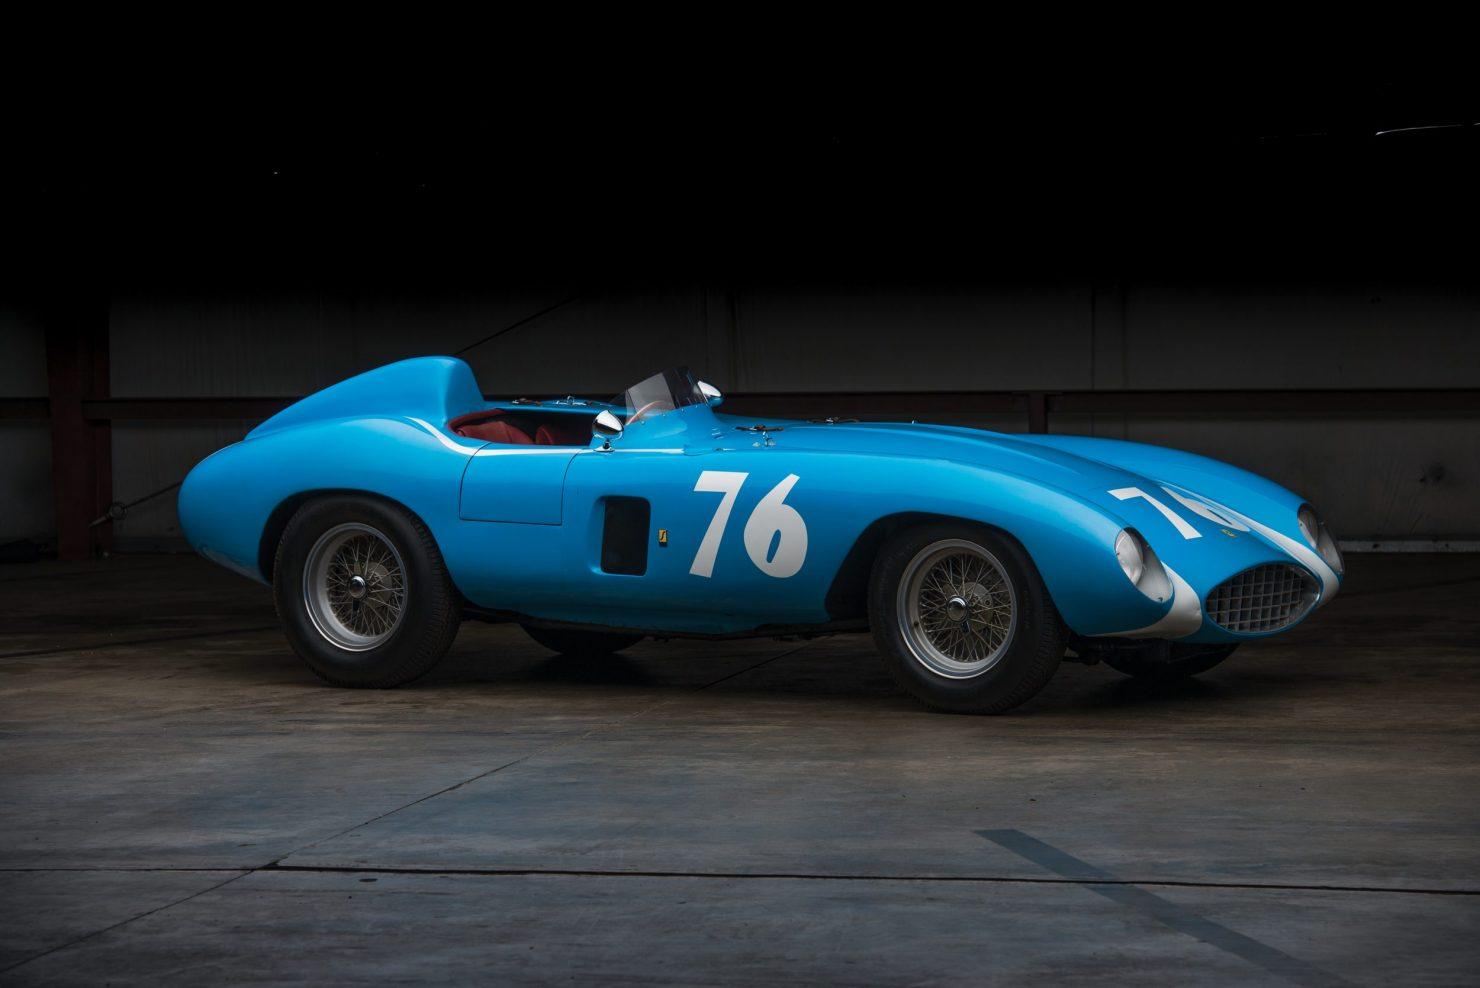 ferrari 121 lm spider 18 1480x988 - 1955 Ferrari 121 LM